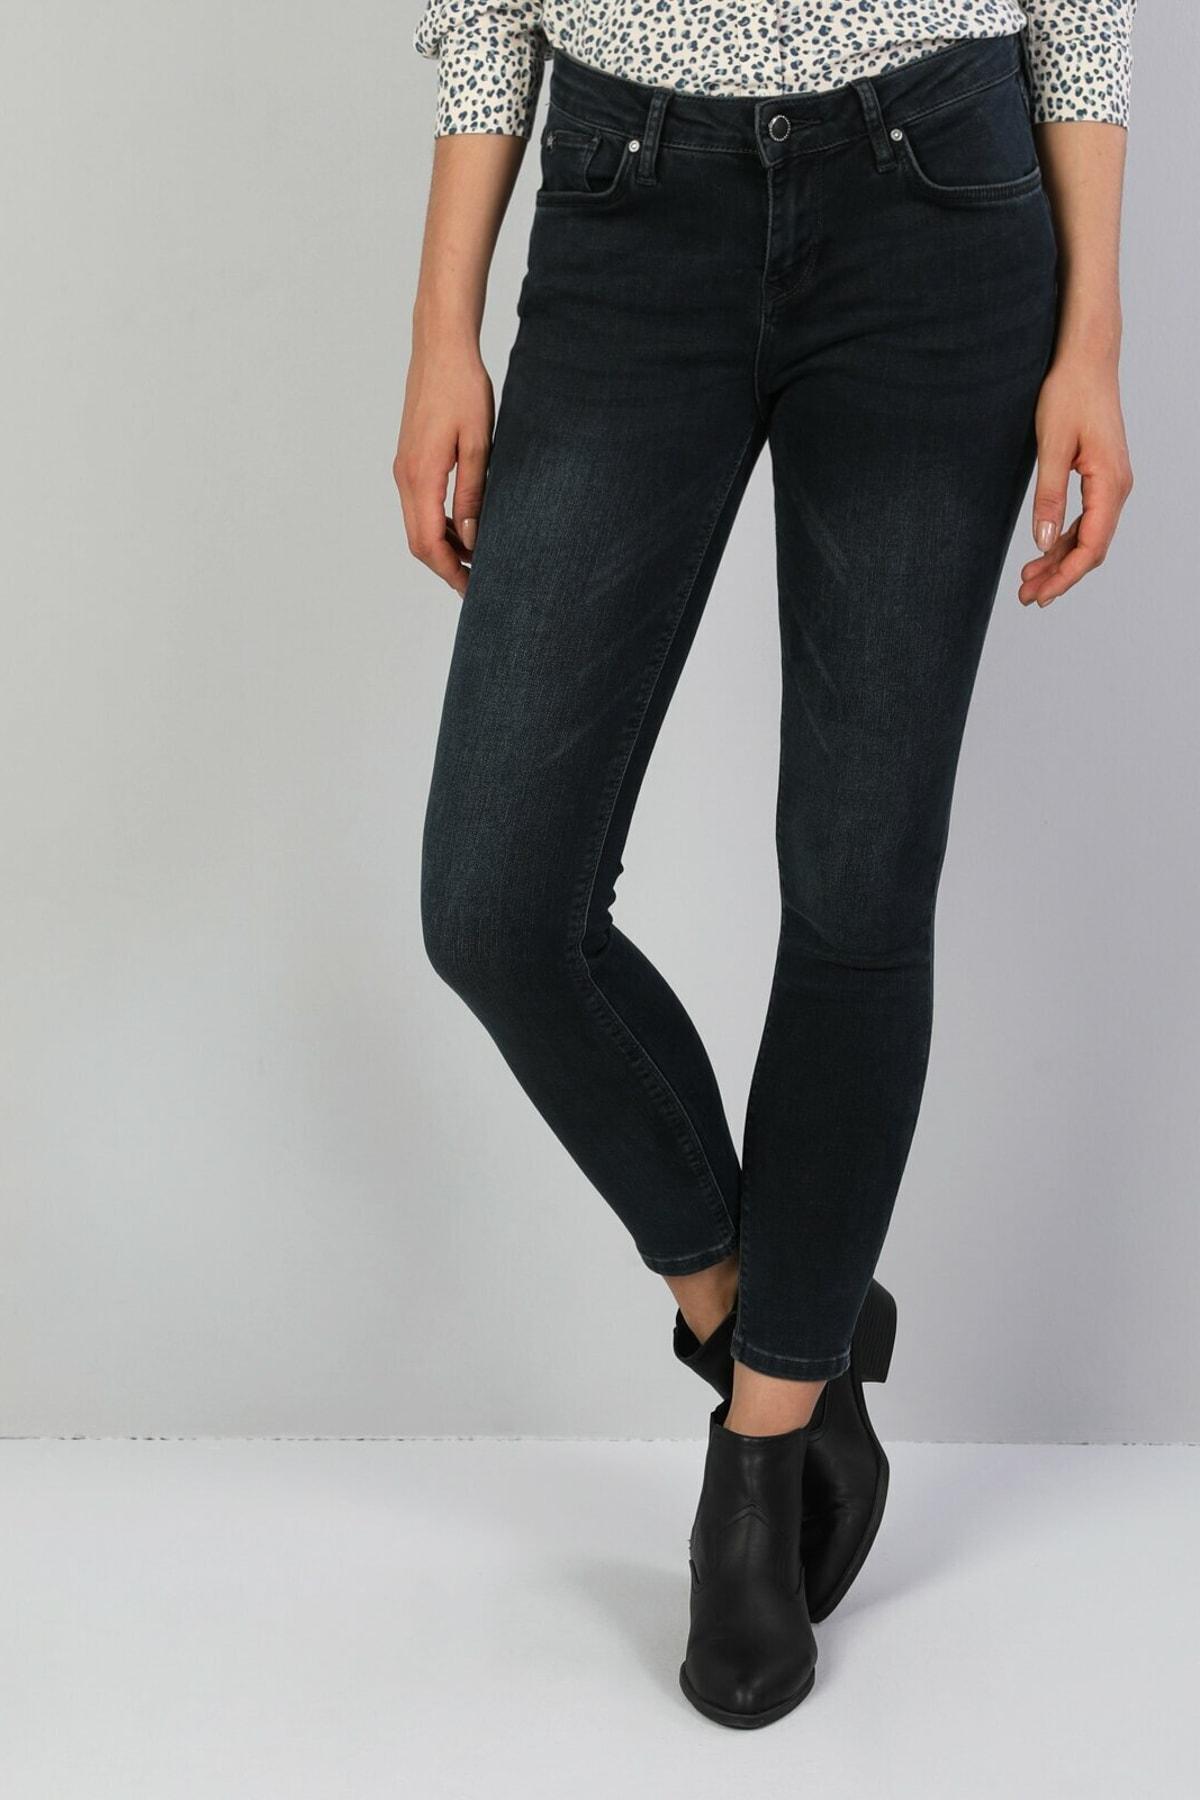 Colin's Kadın Jeans CL1047039 1